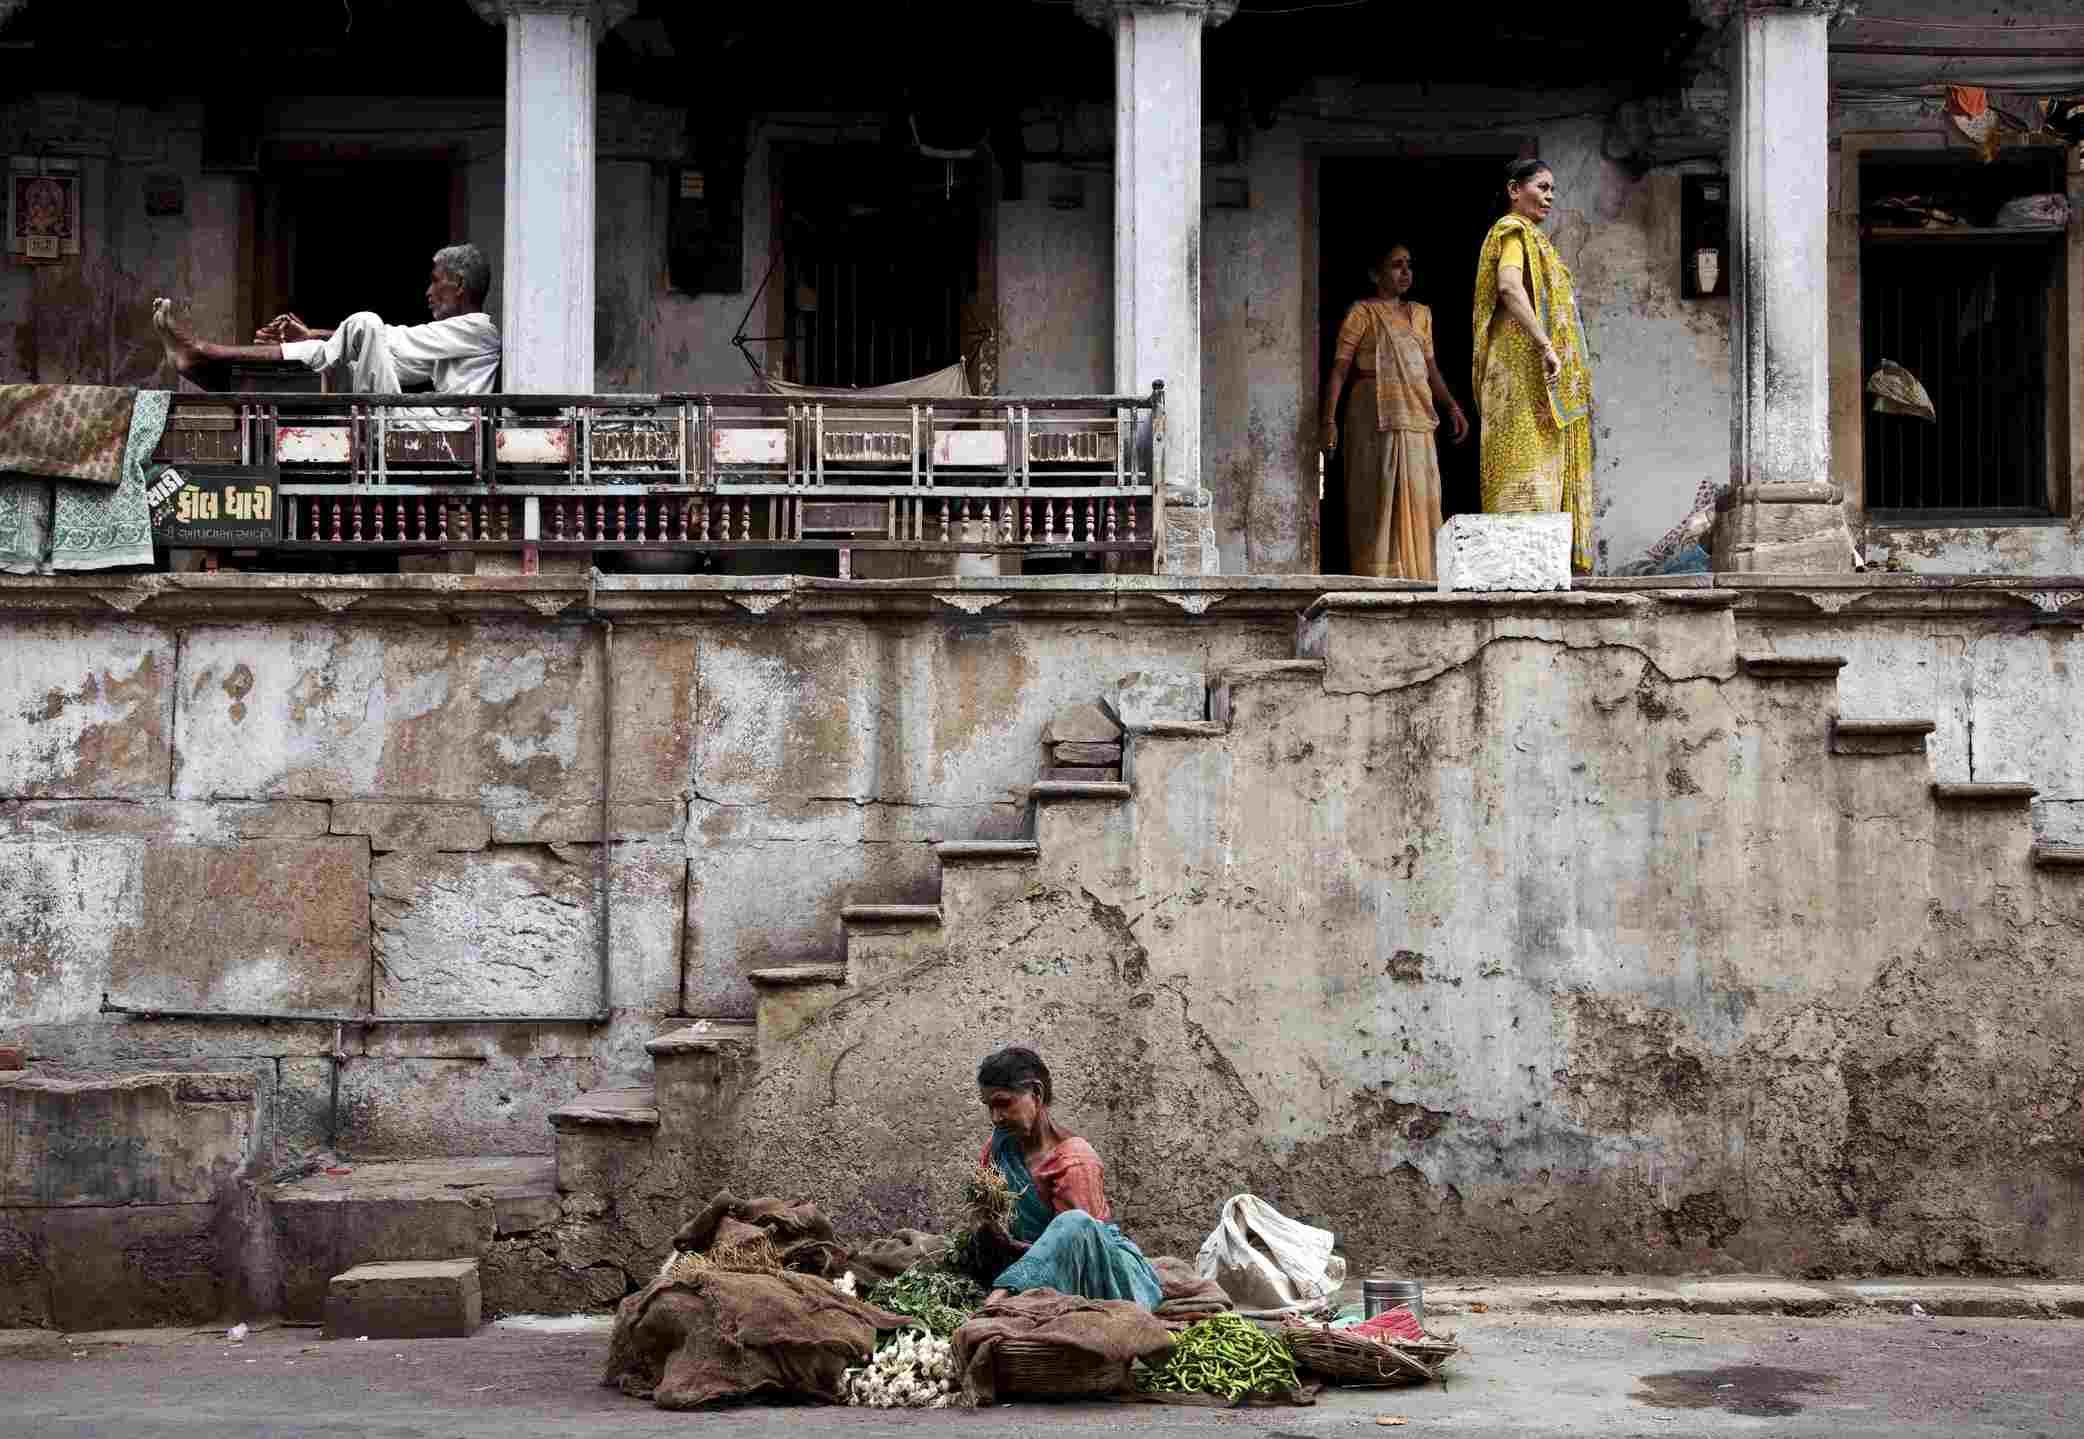 Ciudad Vieja, Ahmedabad, Gujarat, India